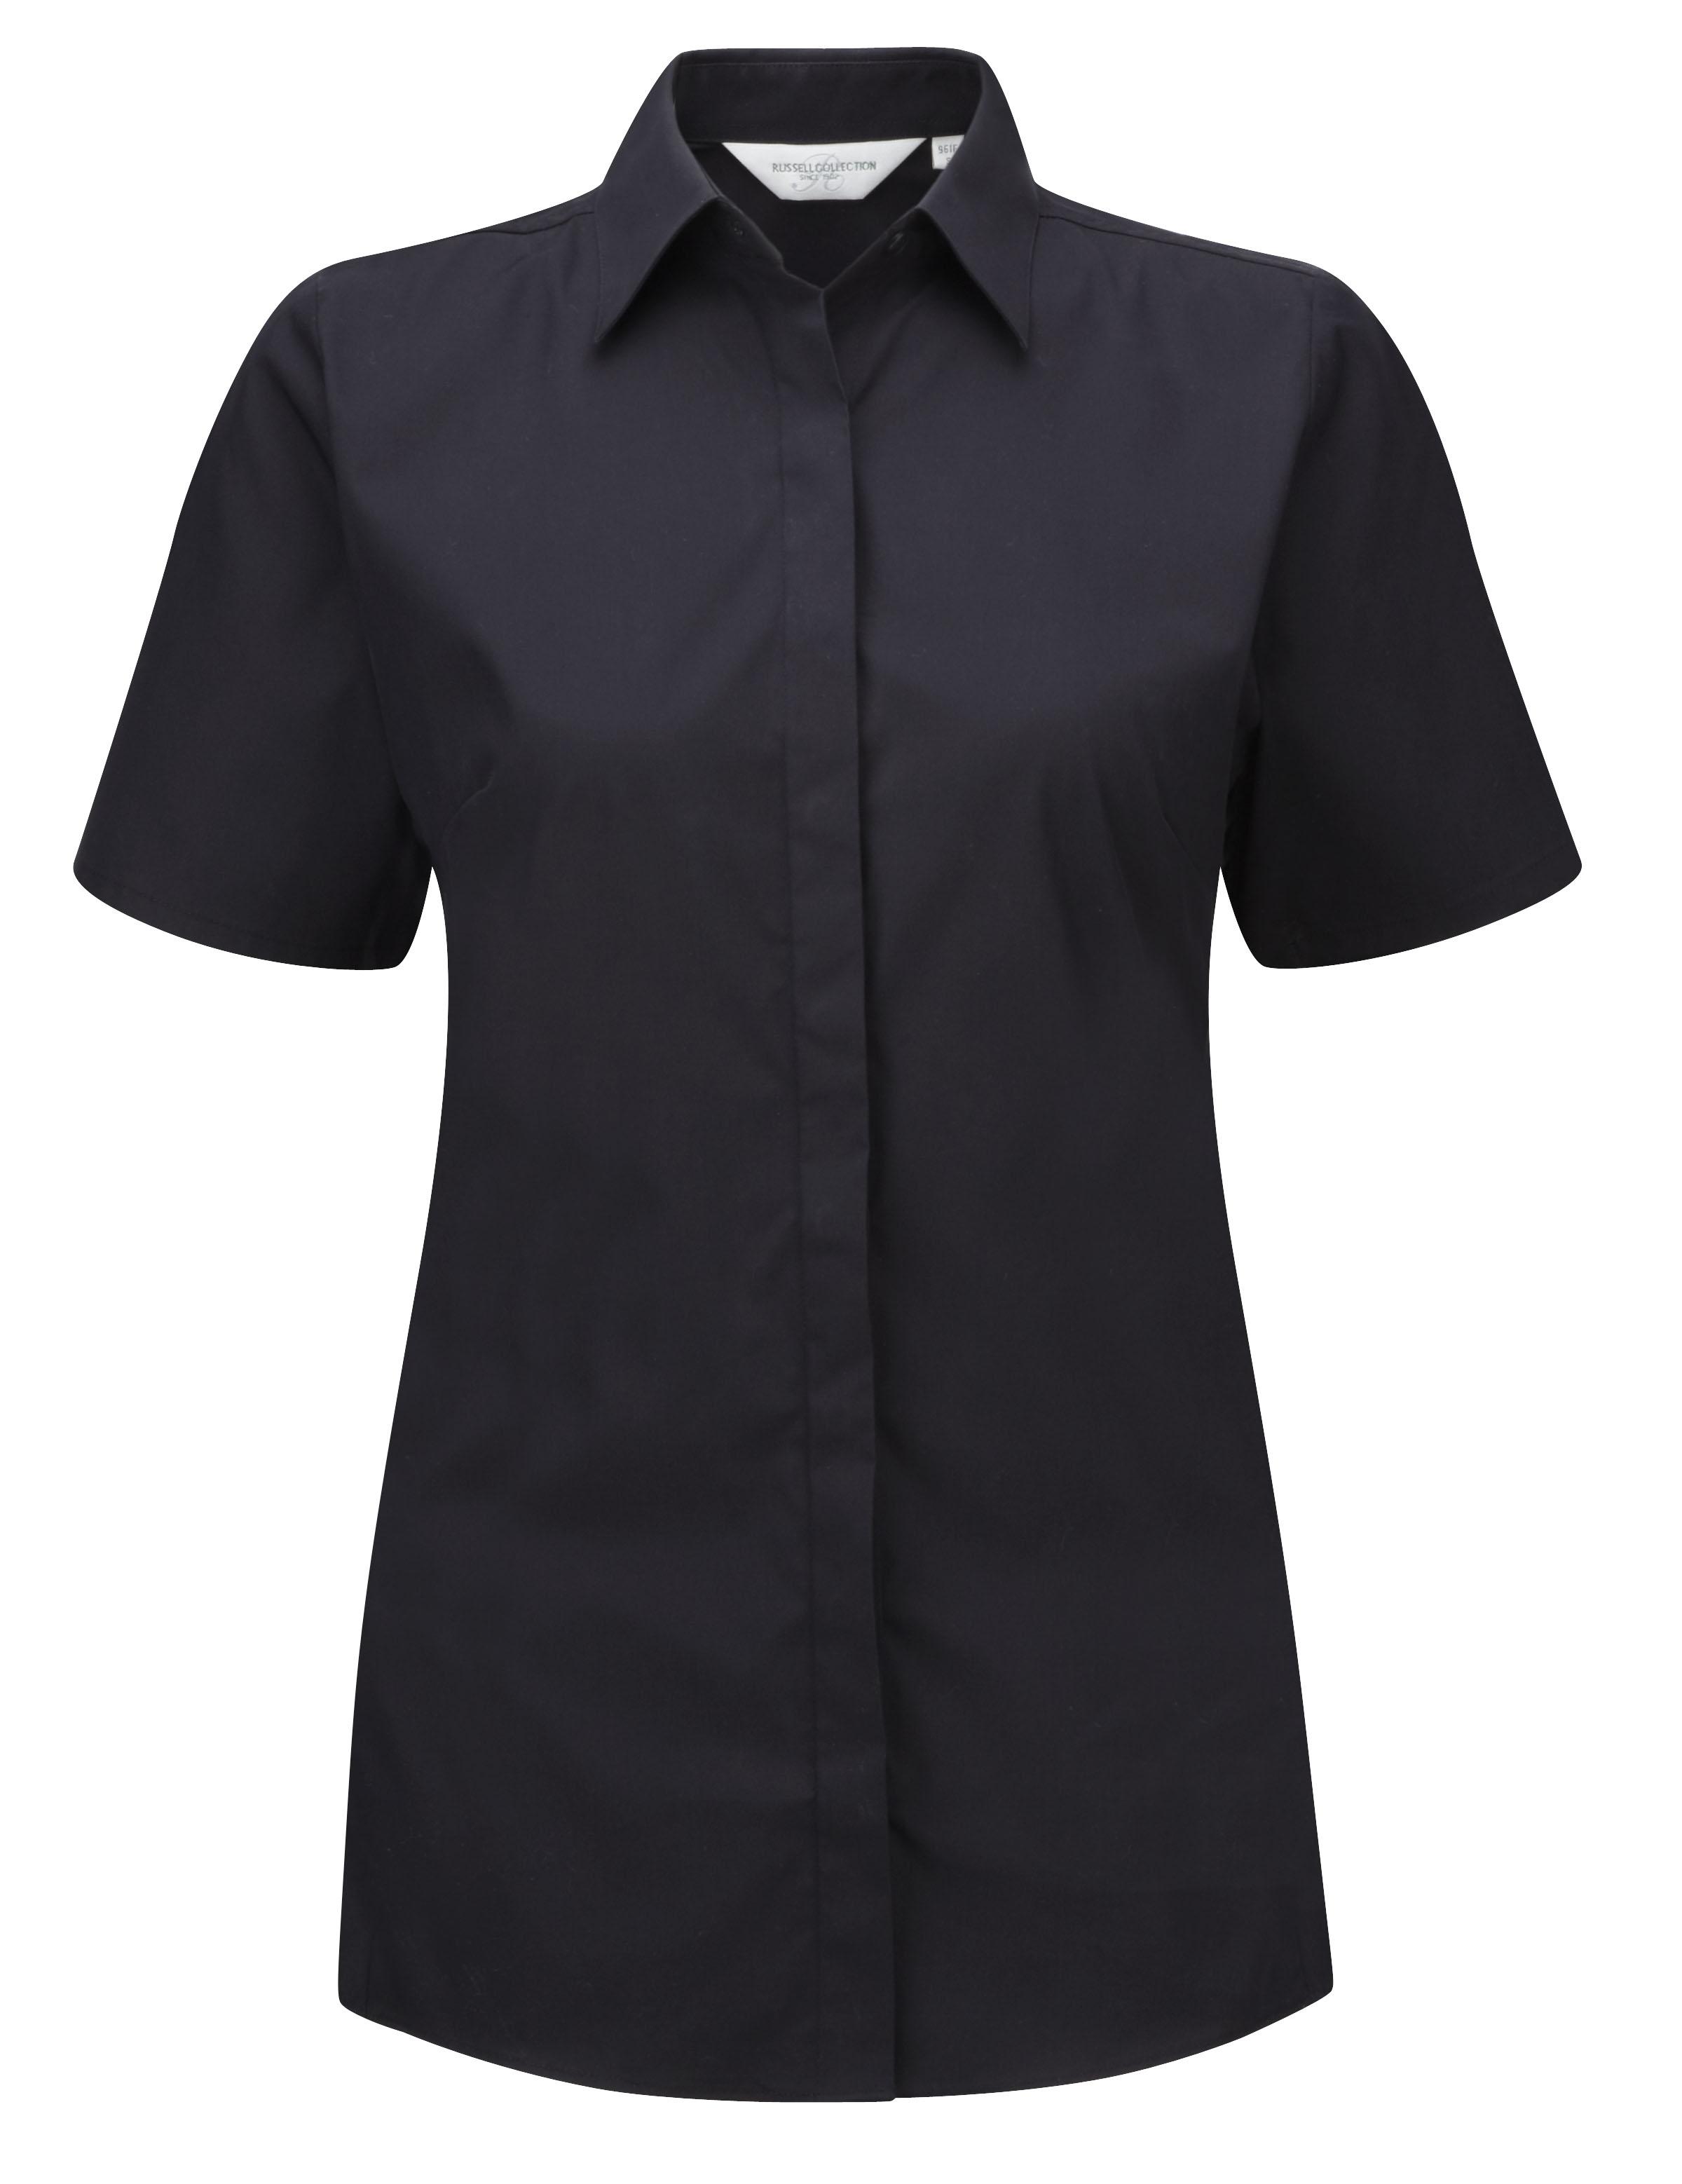 Ultimate Stretch Bluse kurzarm